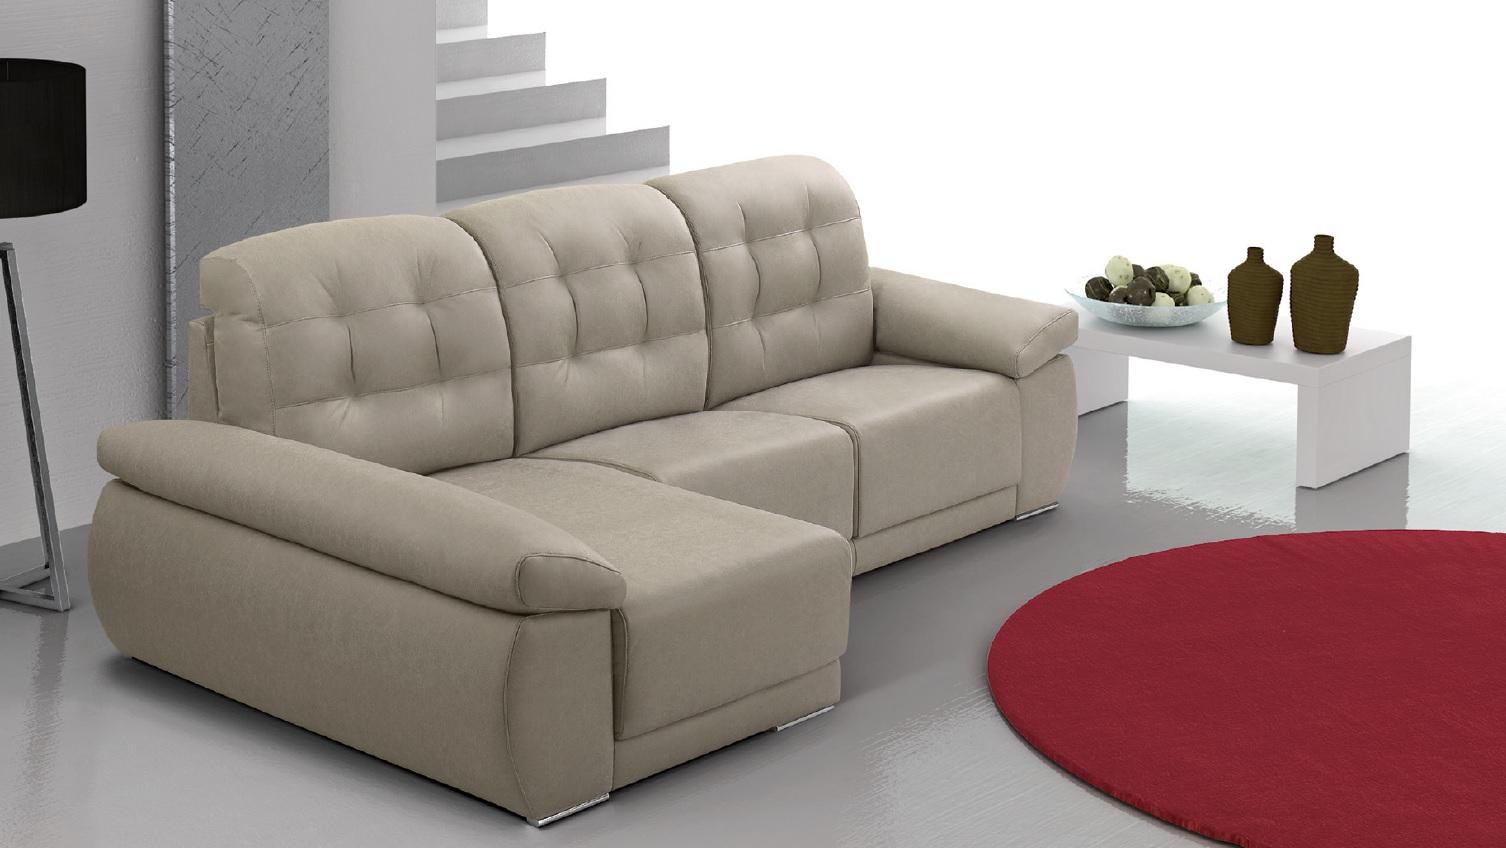 Tu tienda ahorro sof modelo toscana de juraco for Muebles la toskana